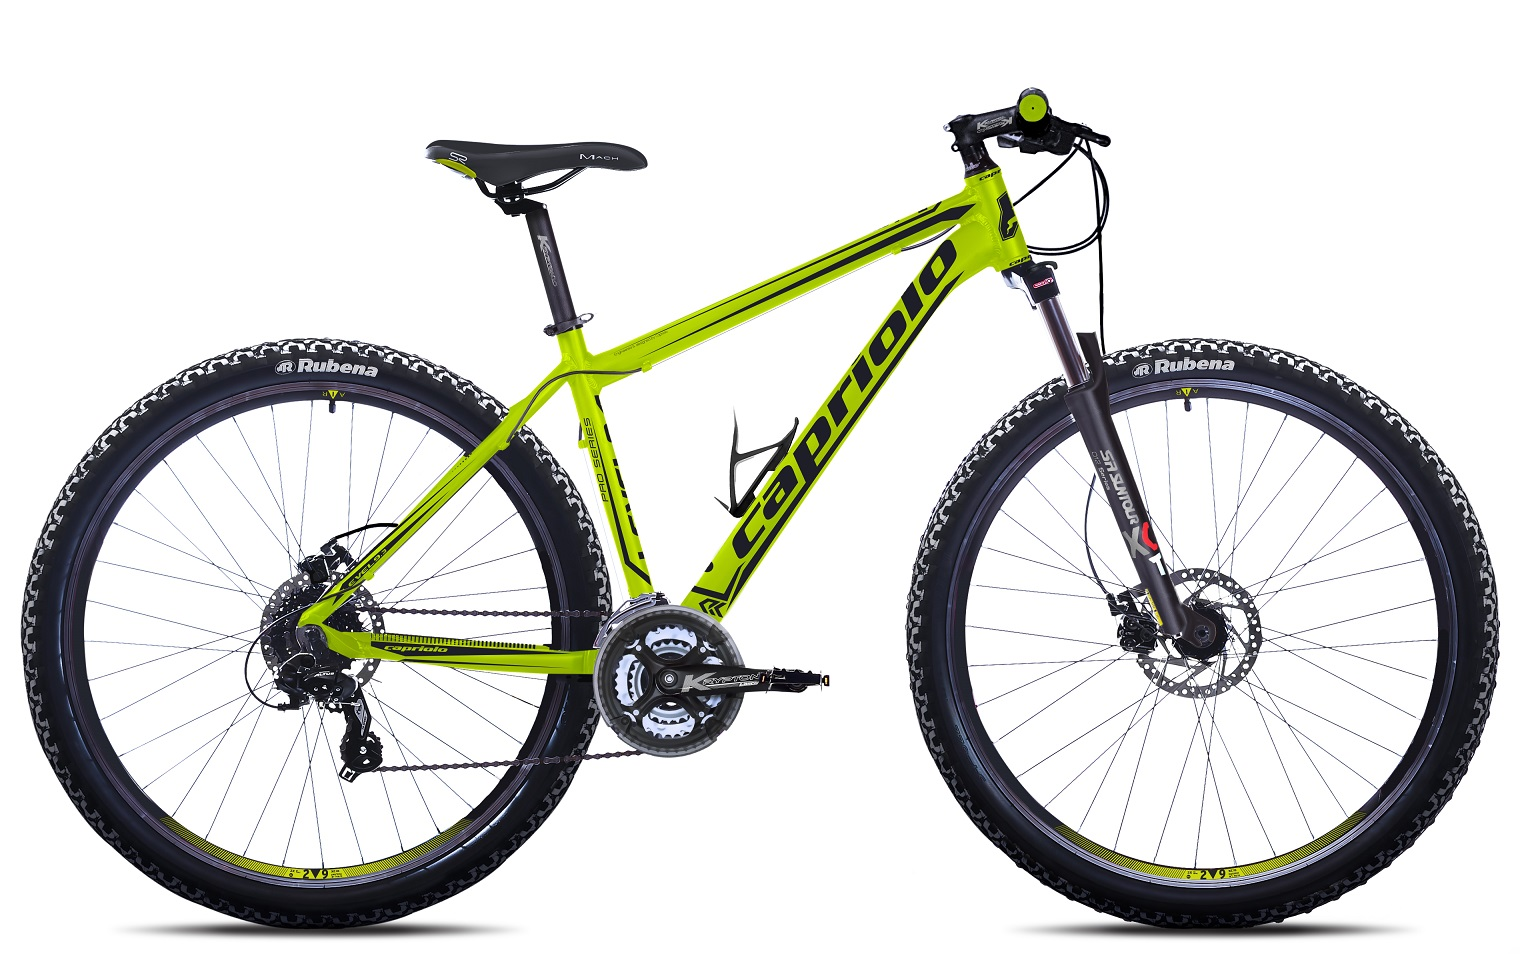 bicikl-29-mtb-level-9-3-pro-races-zeleno-crni